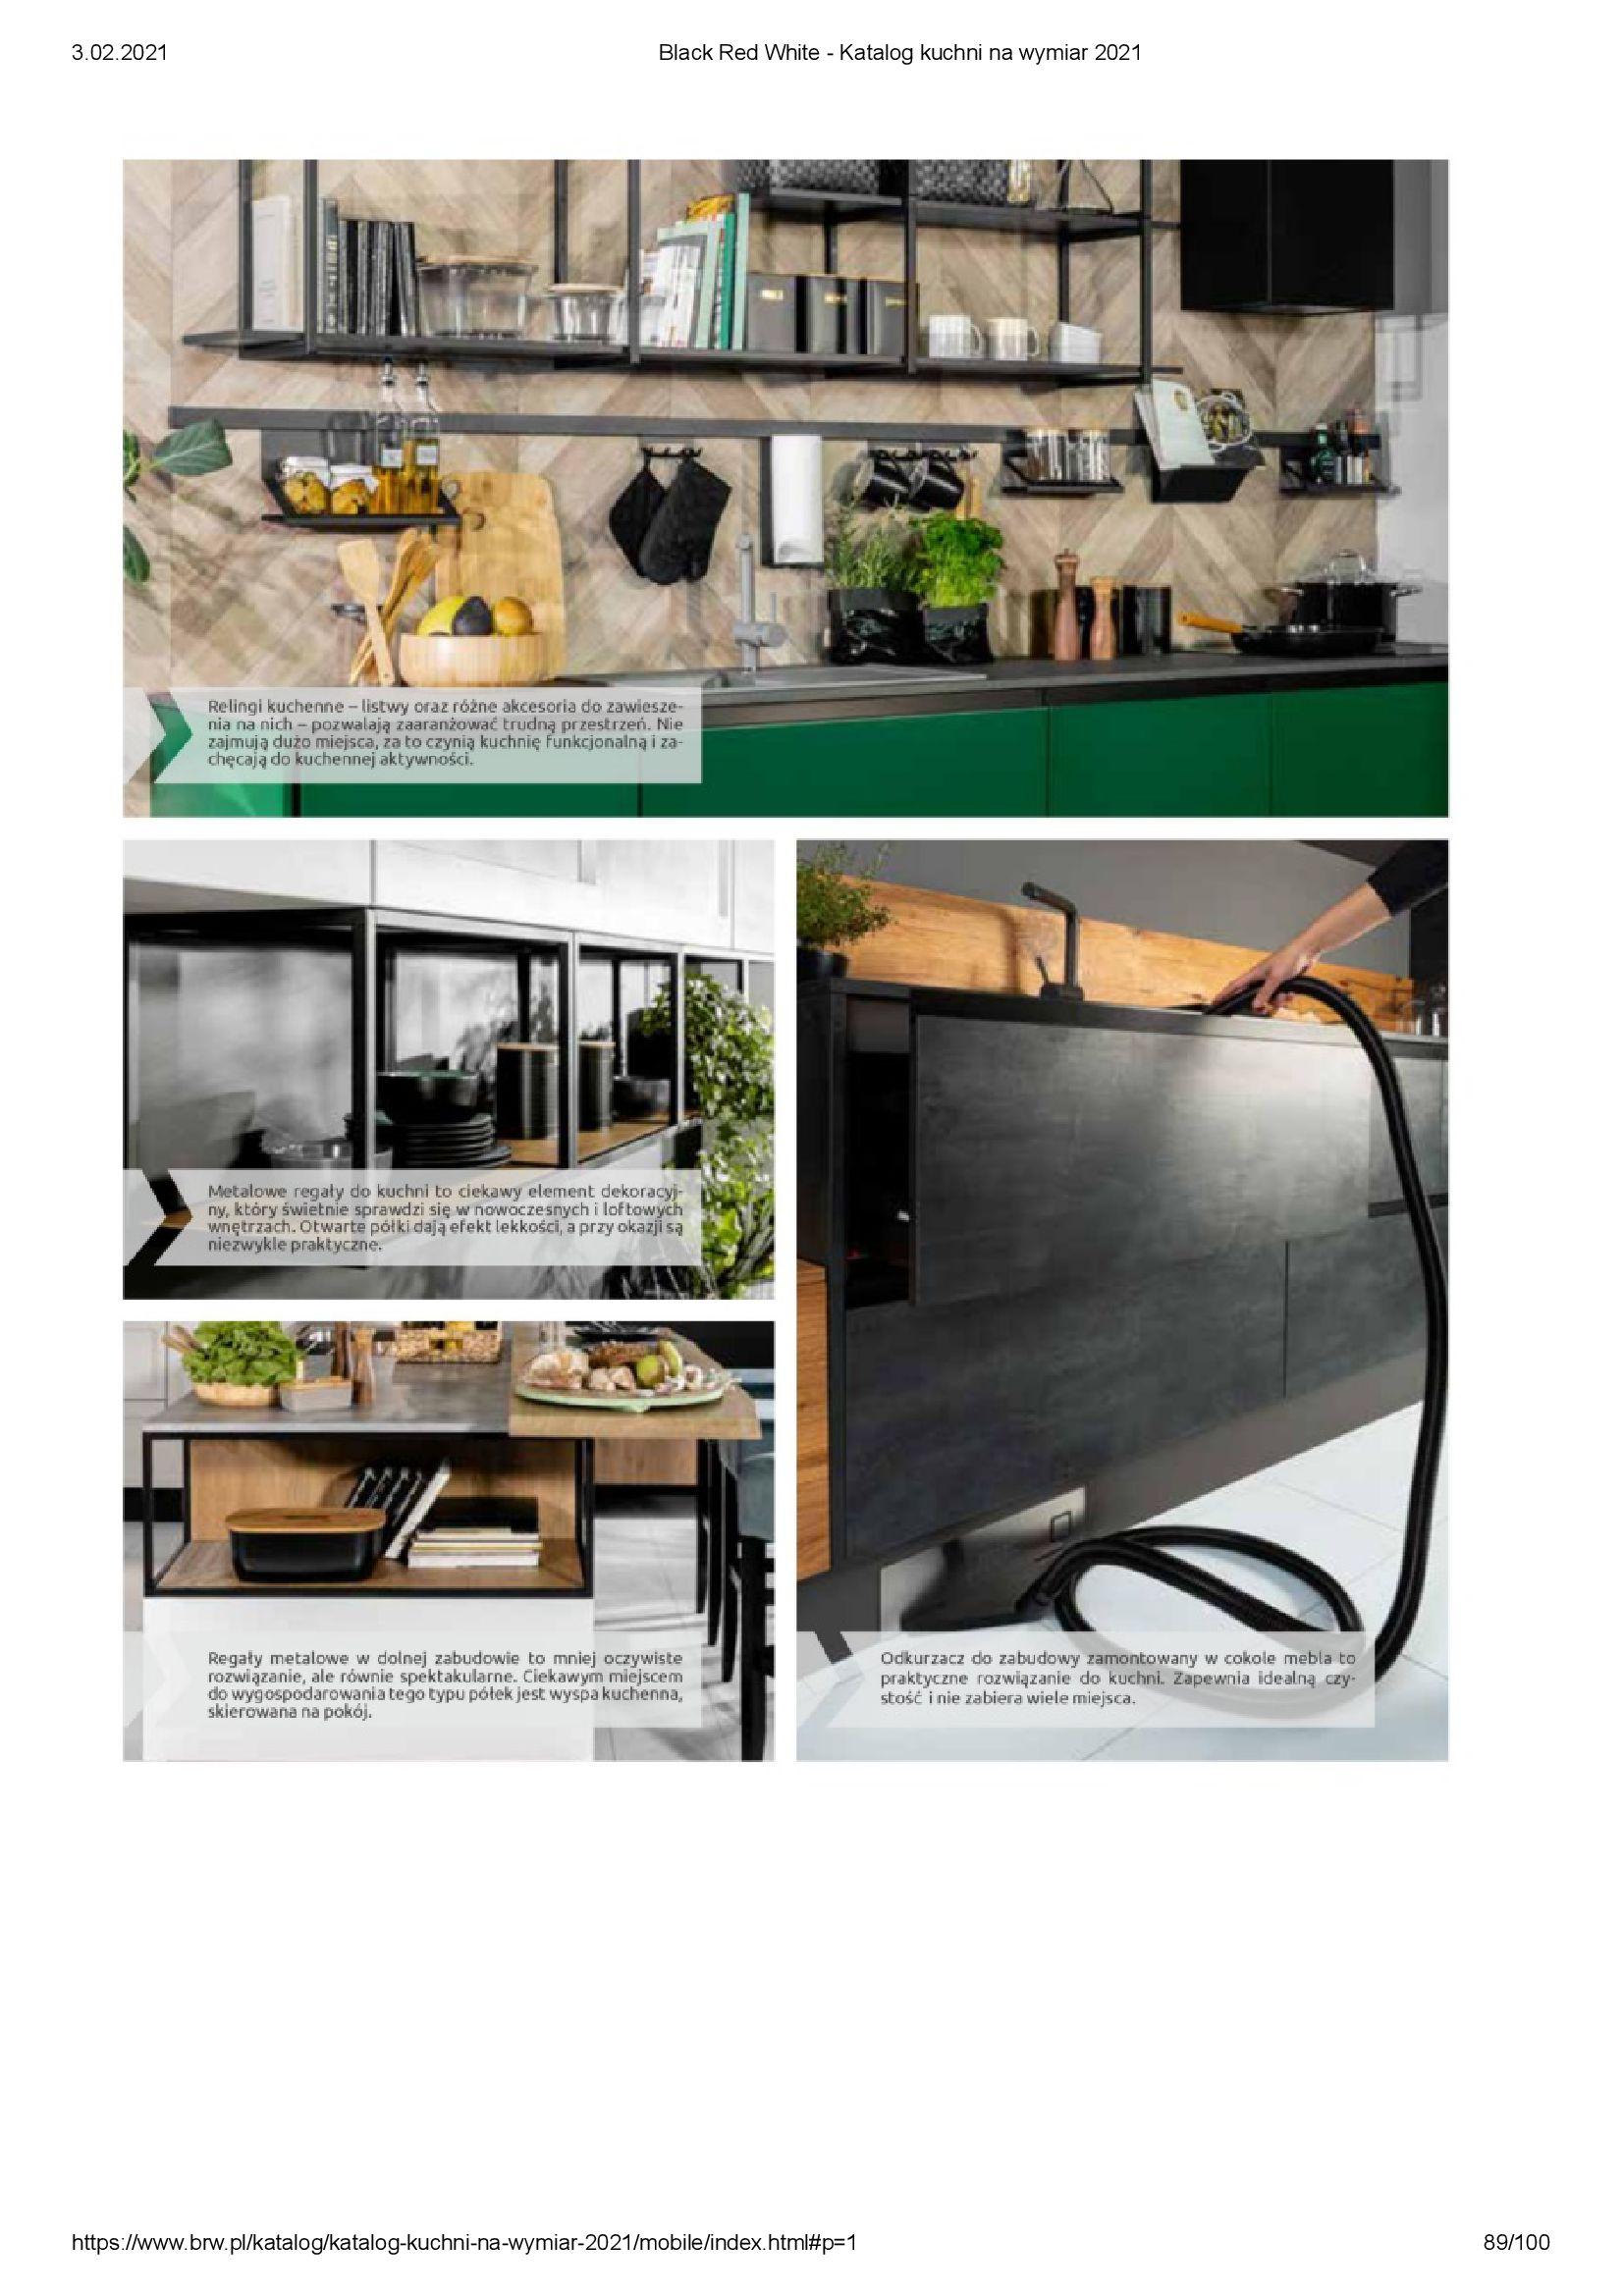 Gazetka Black Red White: Katalog - Kuchnie na wymiar Senso Kitchens 2021 2021-01-01 page-89